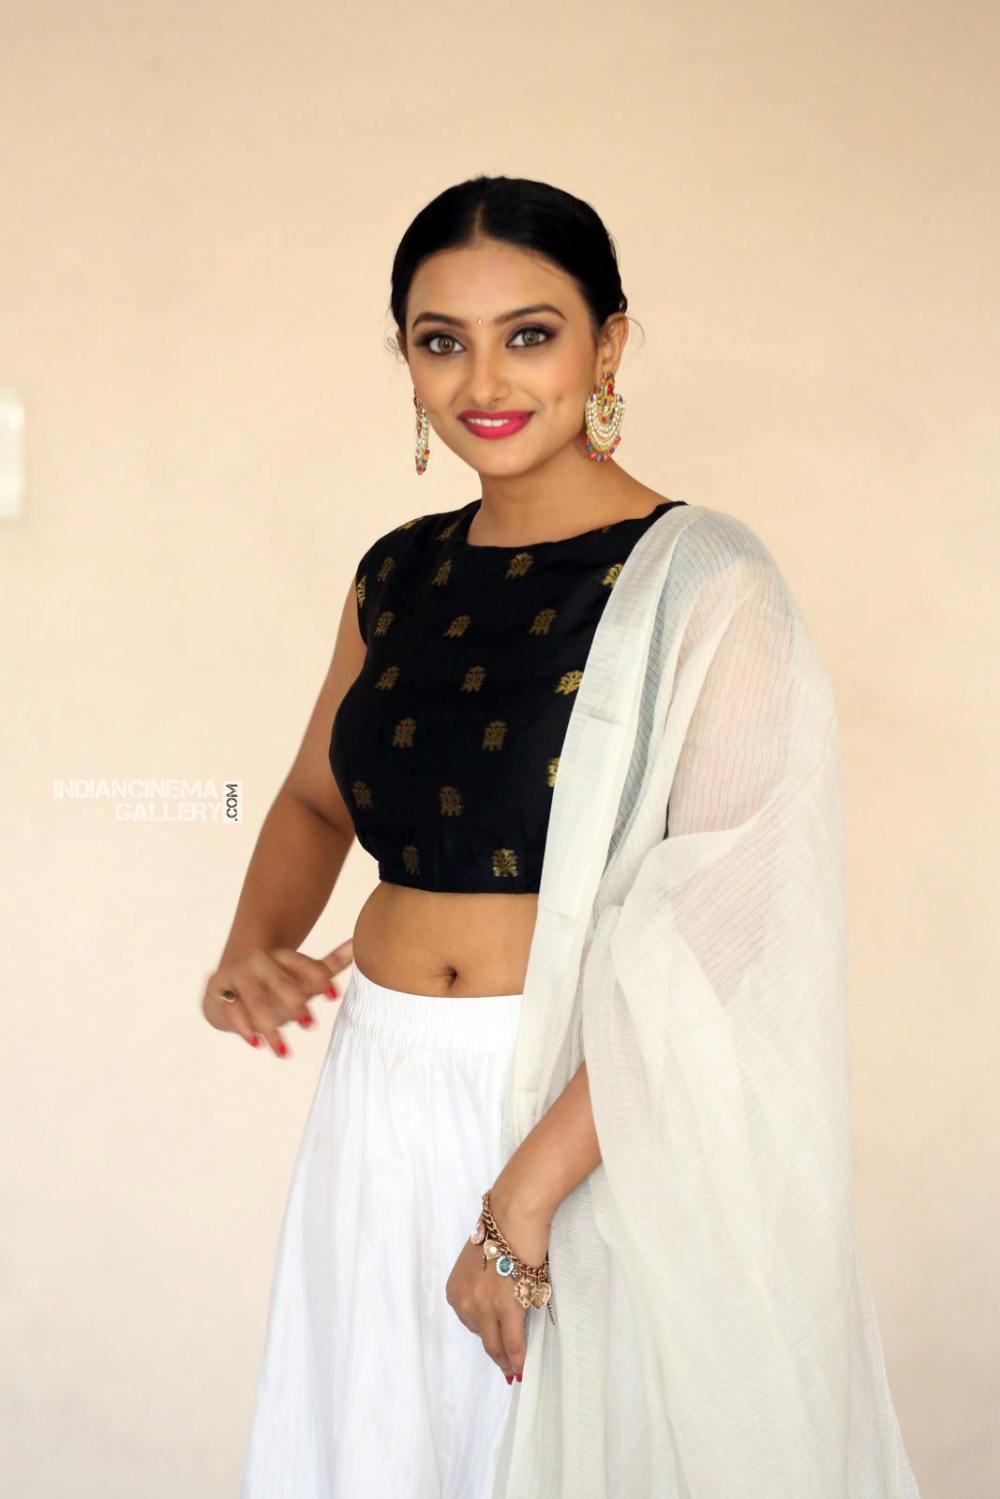 Actress Tuya Chakraborty Stills (7)